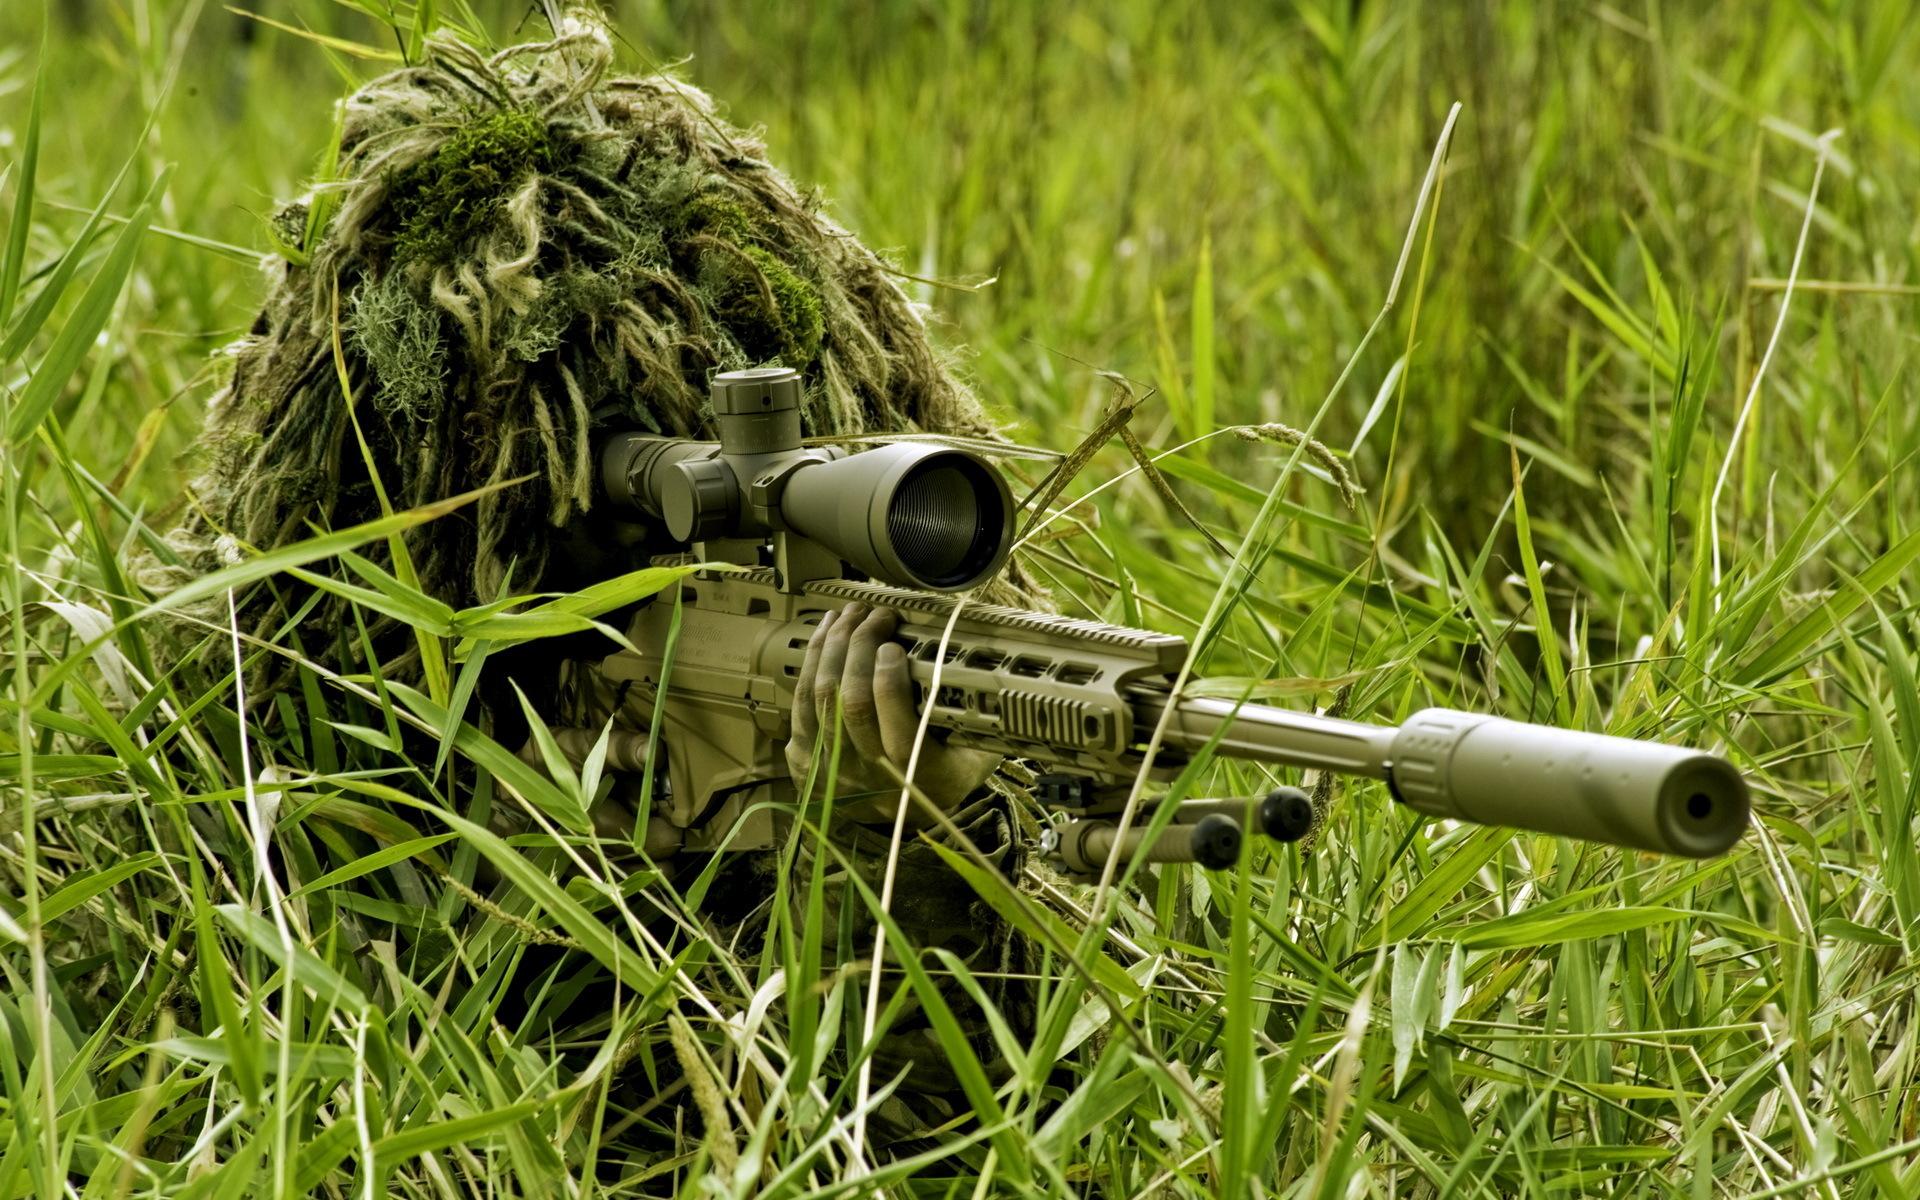 Sniper at work Computer Wallpapers Desktop Backgrounds 1920x1200 1920x1200